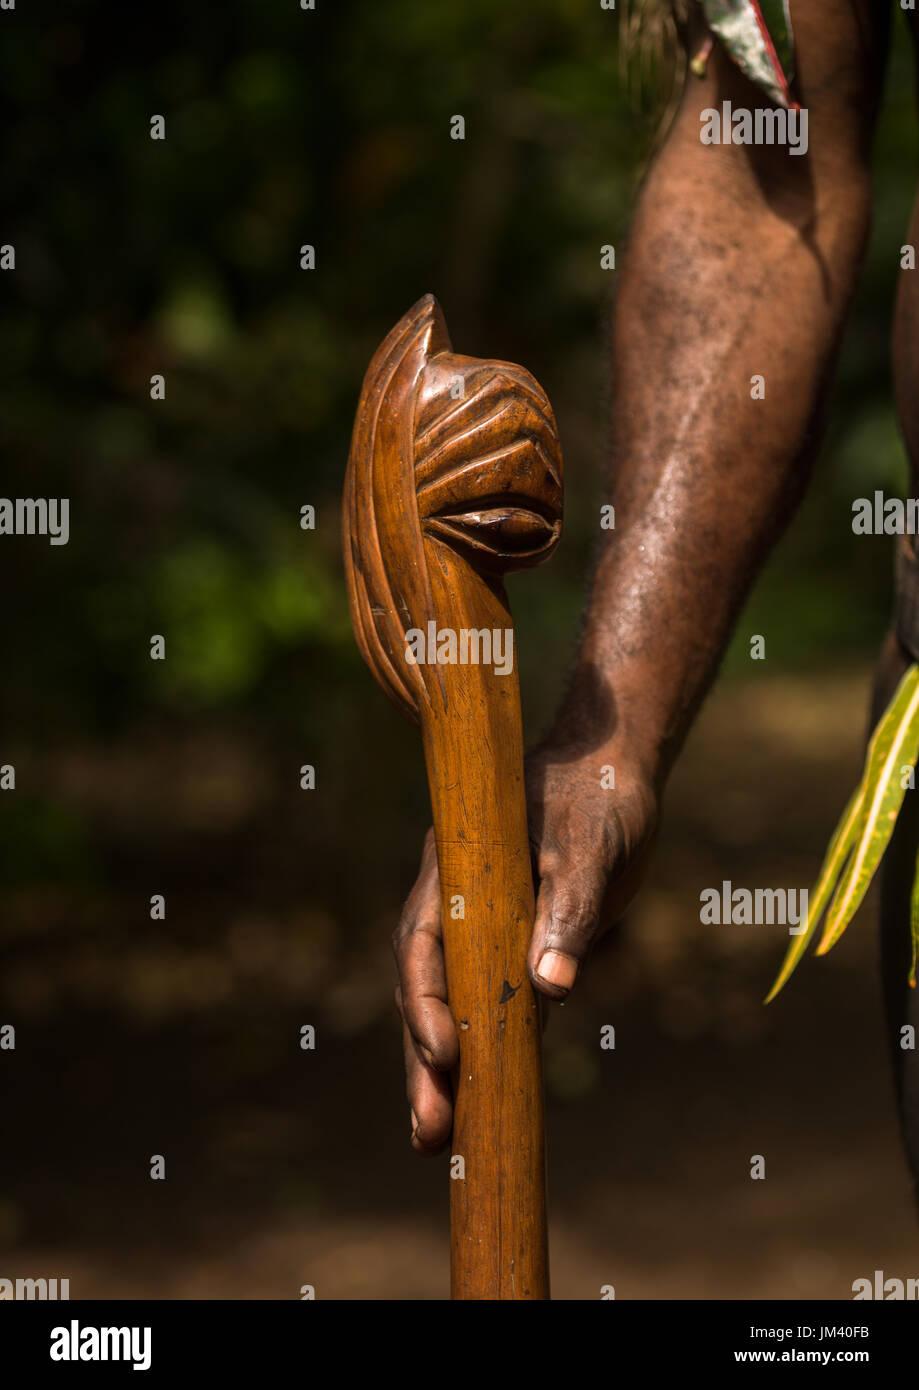 Chief walking stick cane used during the palm tree dance of the Small Nambas tribe, Malekula island, Gortiengser, Vanuatu - Stock Image